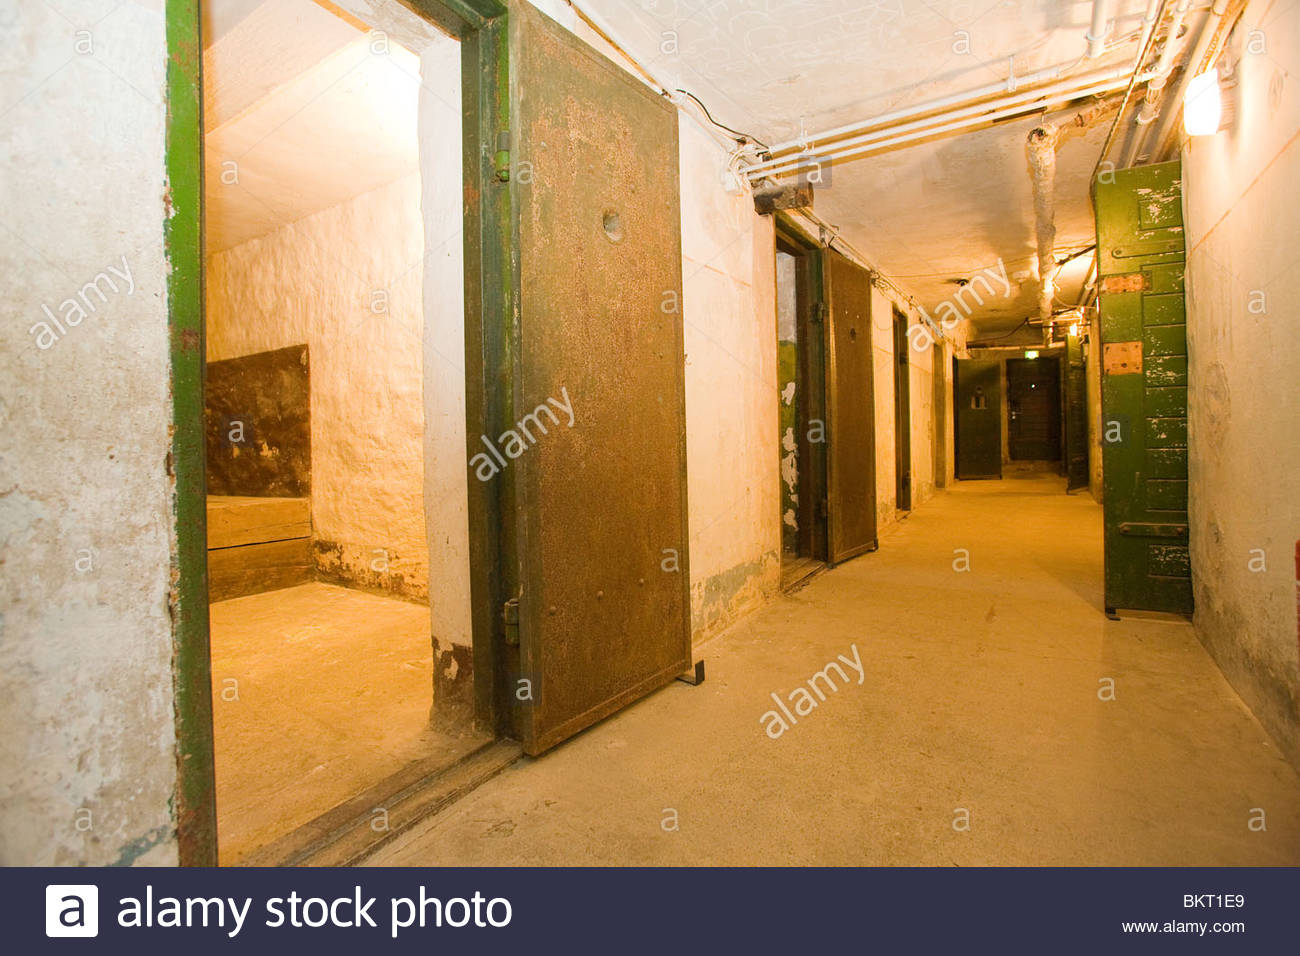 secret prison for the political prisoners,now a museum,Potsdam,Brandenburg,Germany Stock Photo